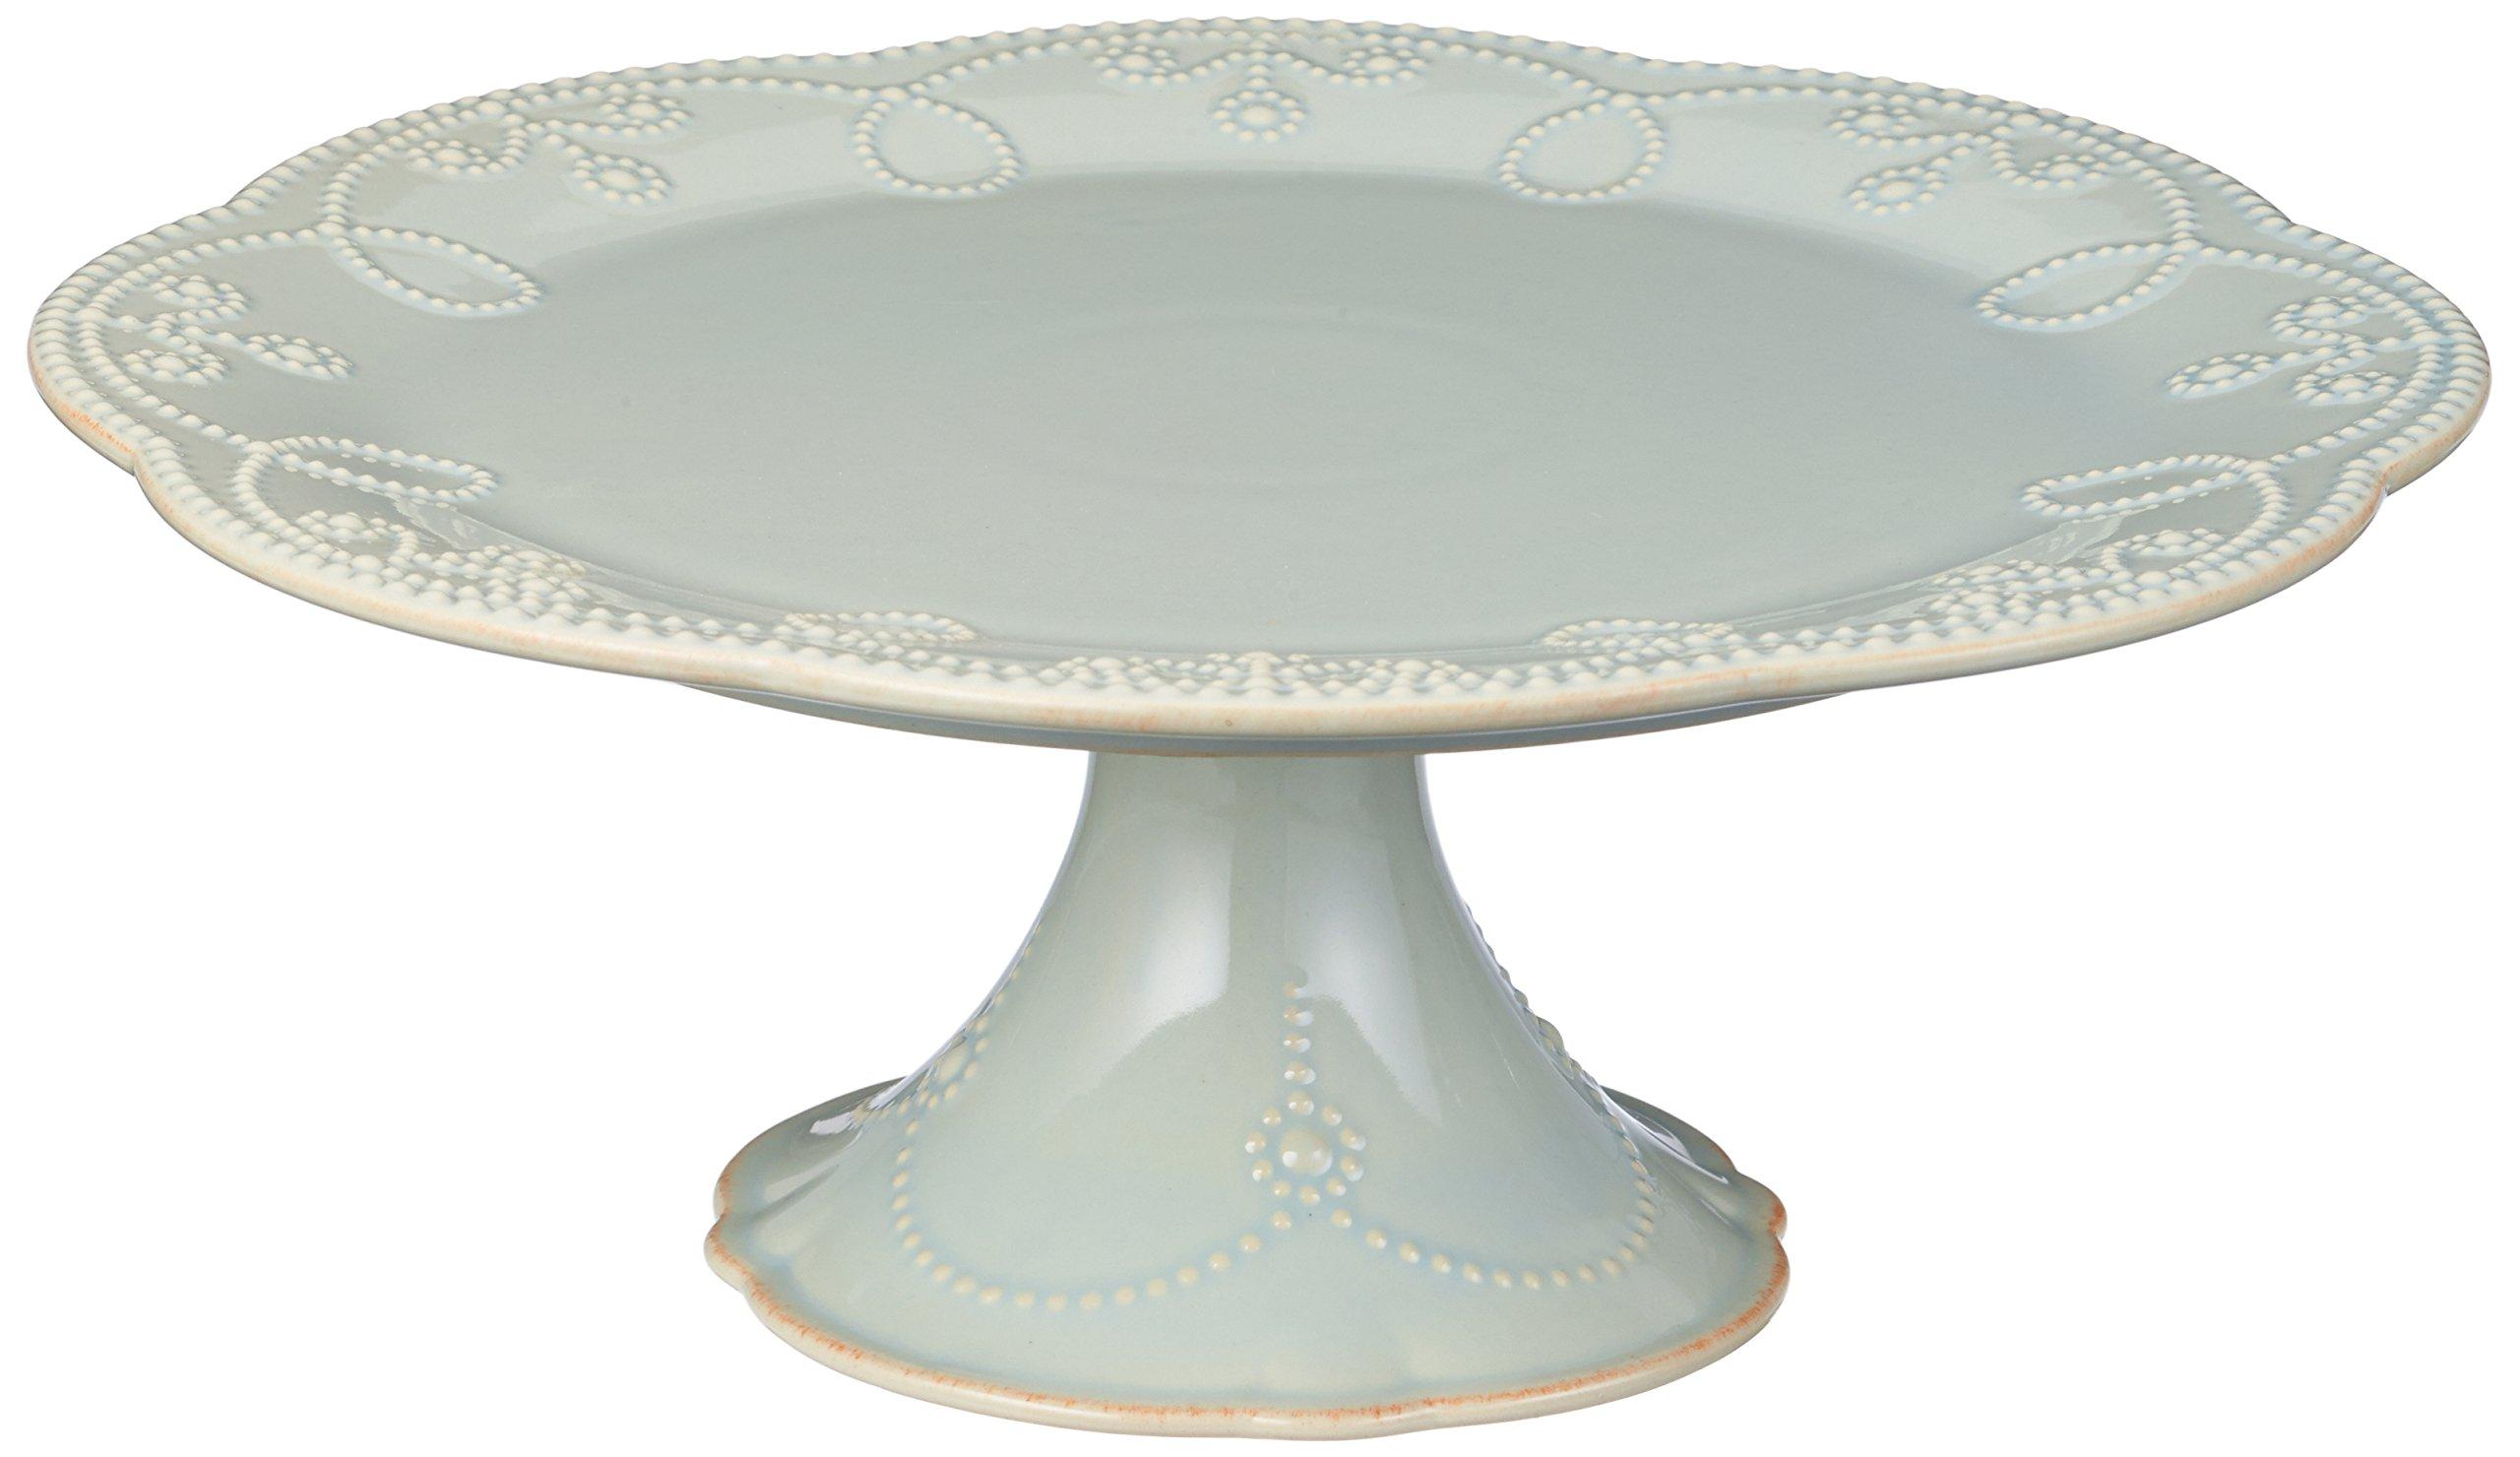 Lenox French Perle Pedestal Cake Plate, Medium, Ice Blue - 824766